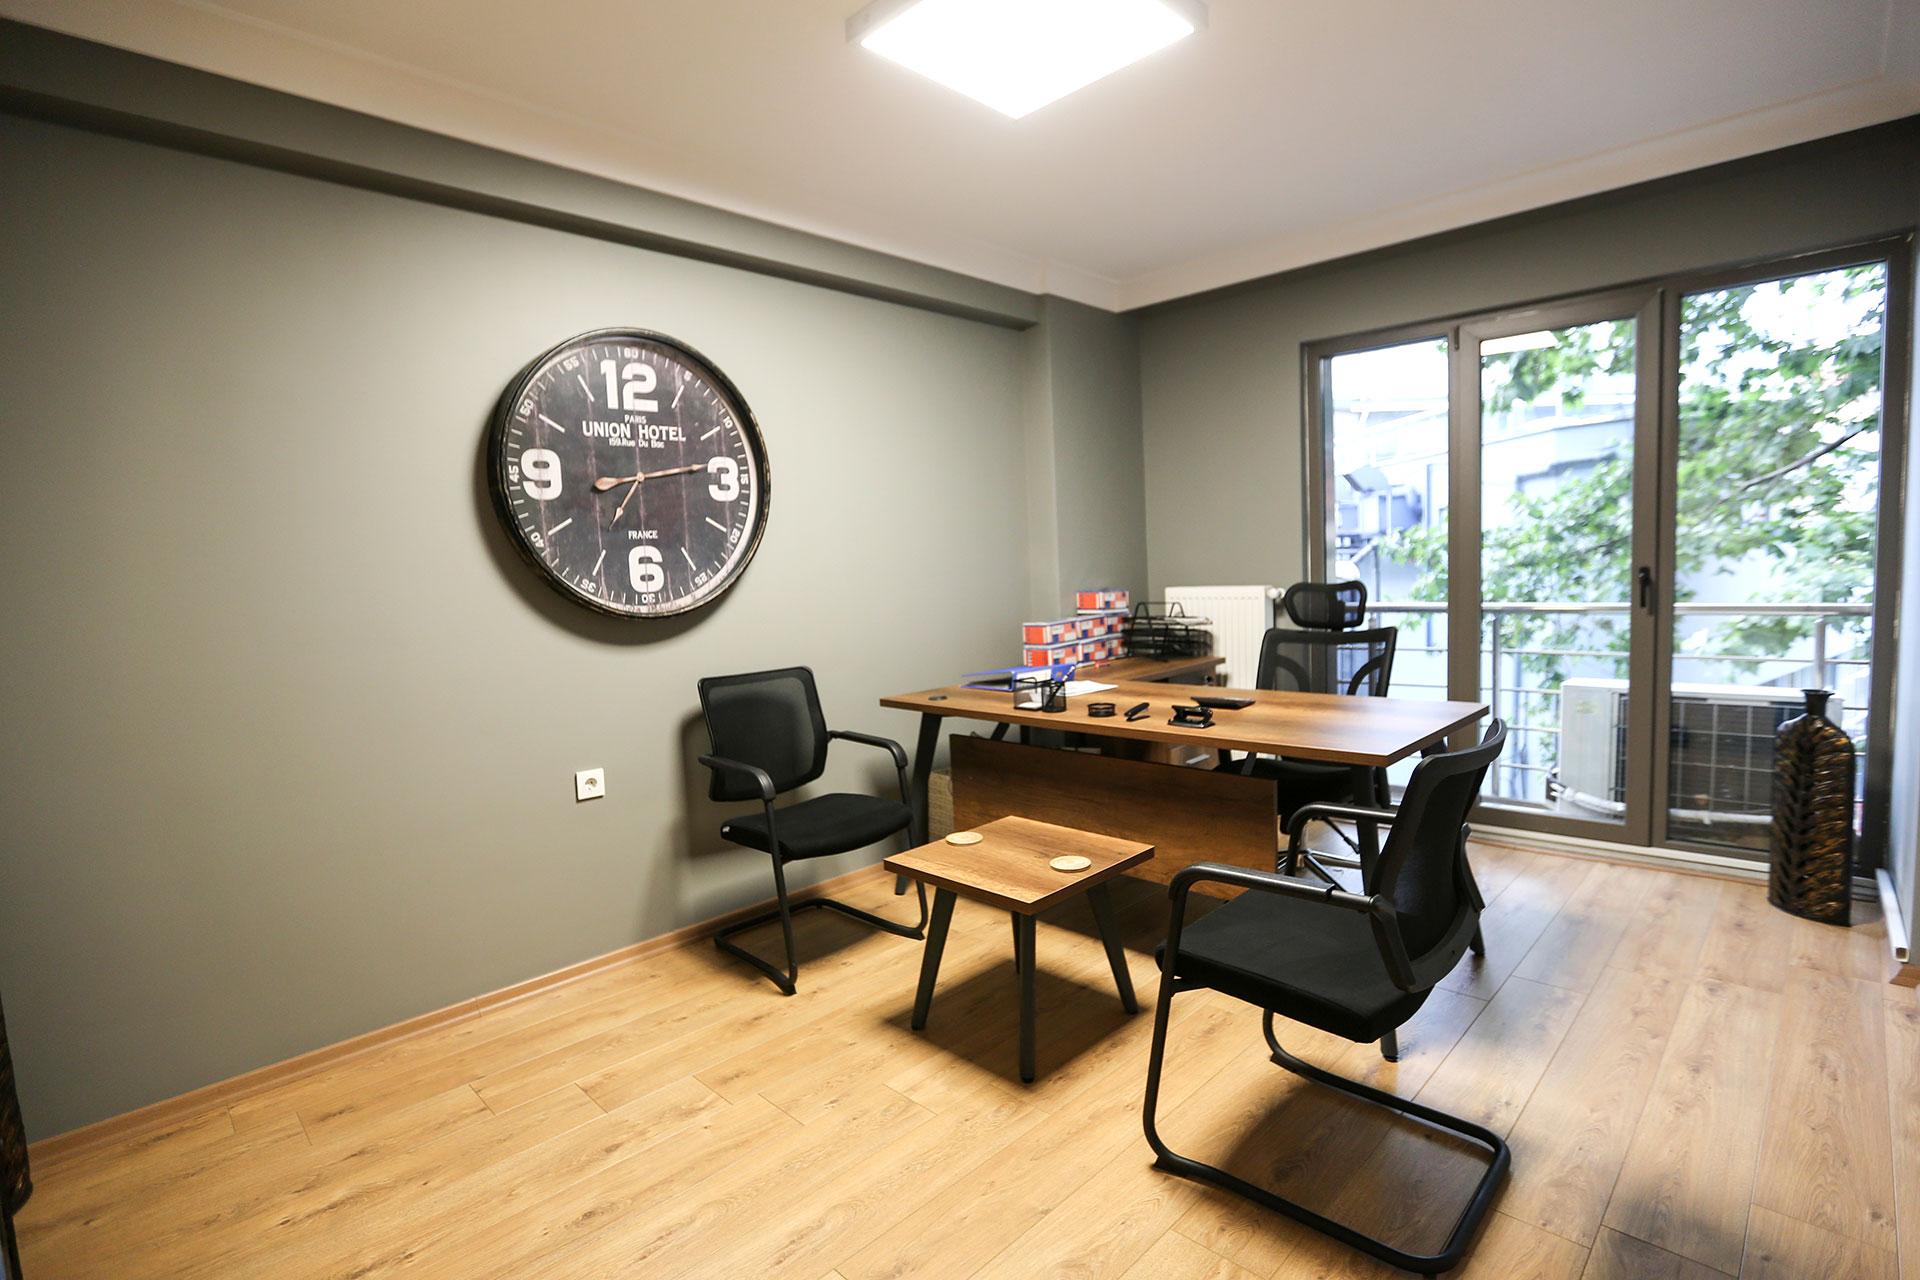 hazır ofis istanbul, avrupa yakası hazır ofis